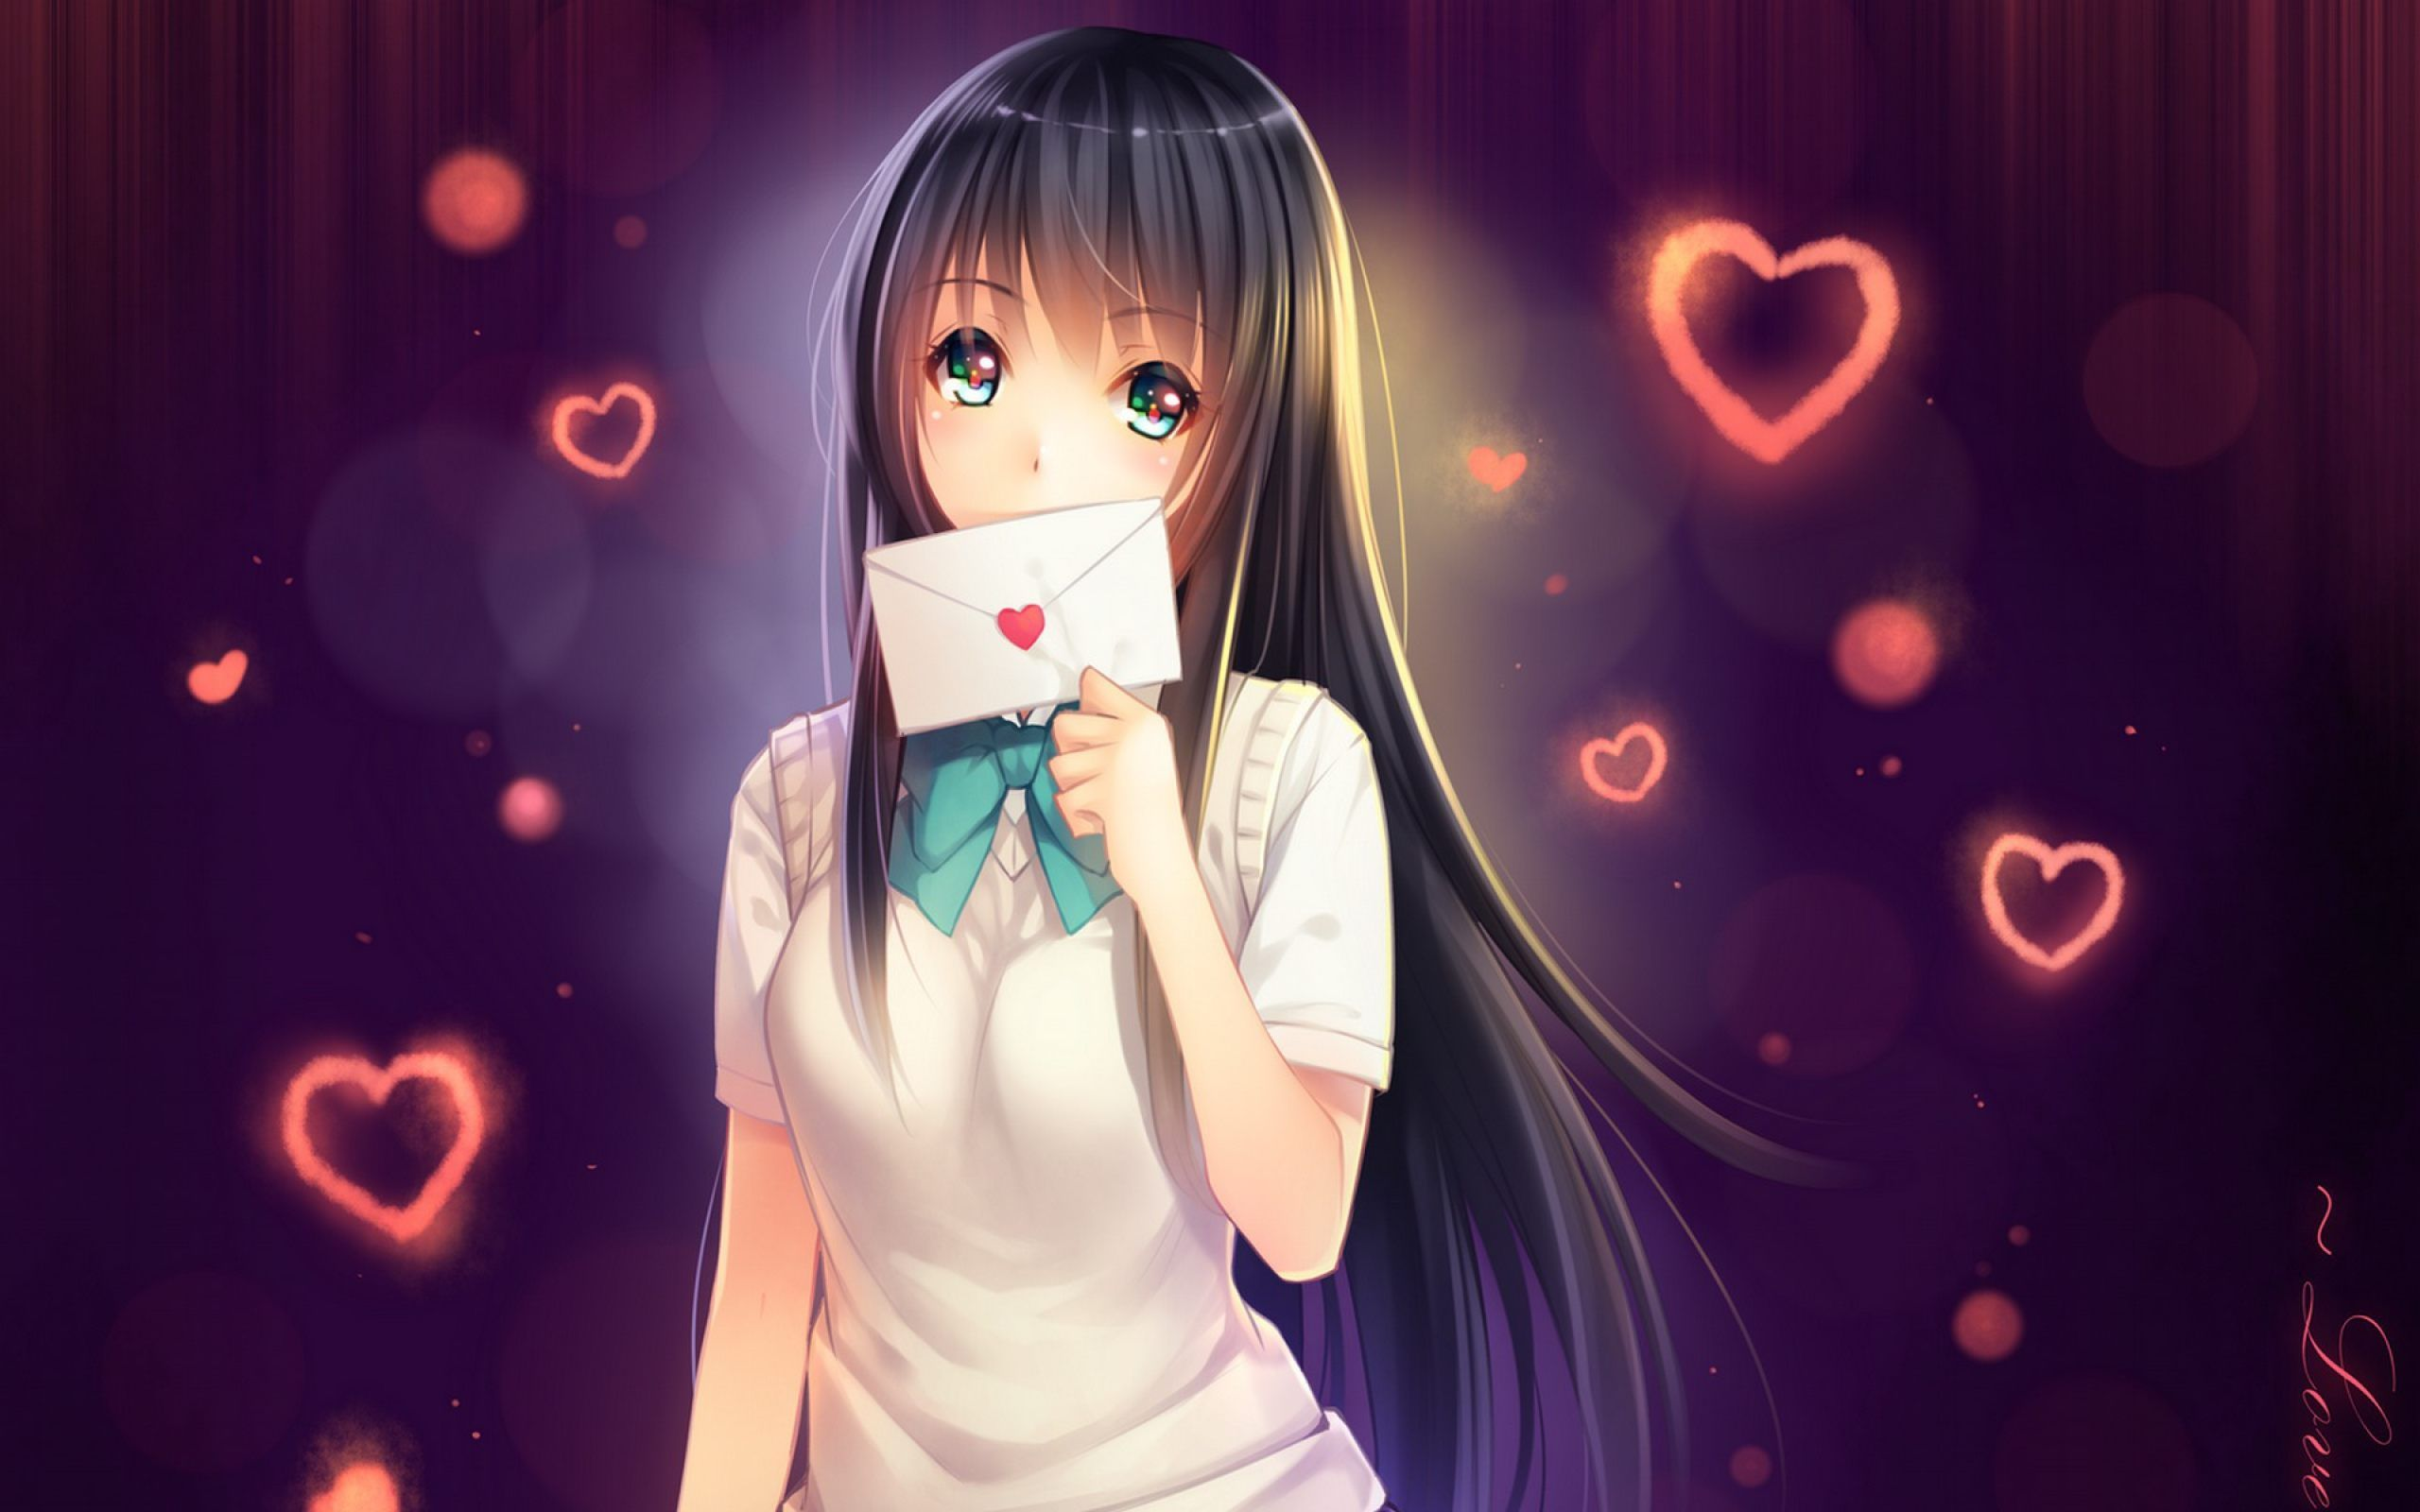 anime love wallpaper picture music girl love cute hd